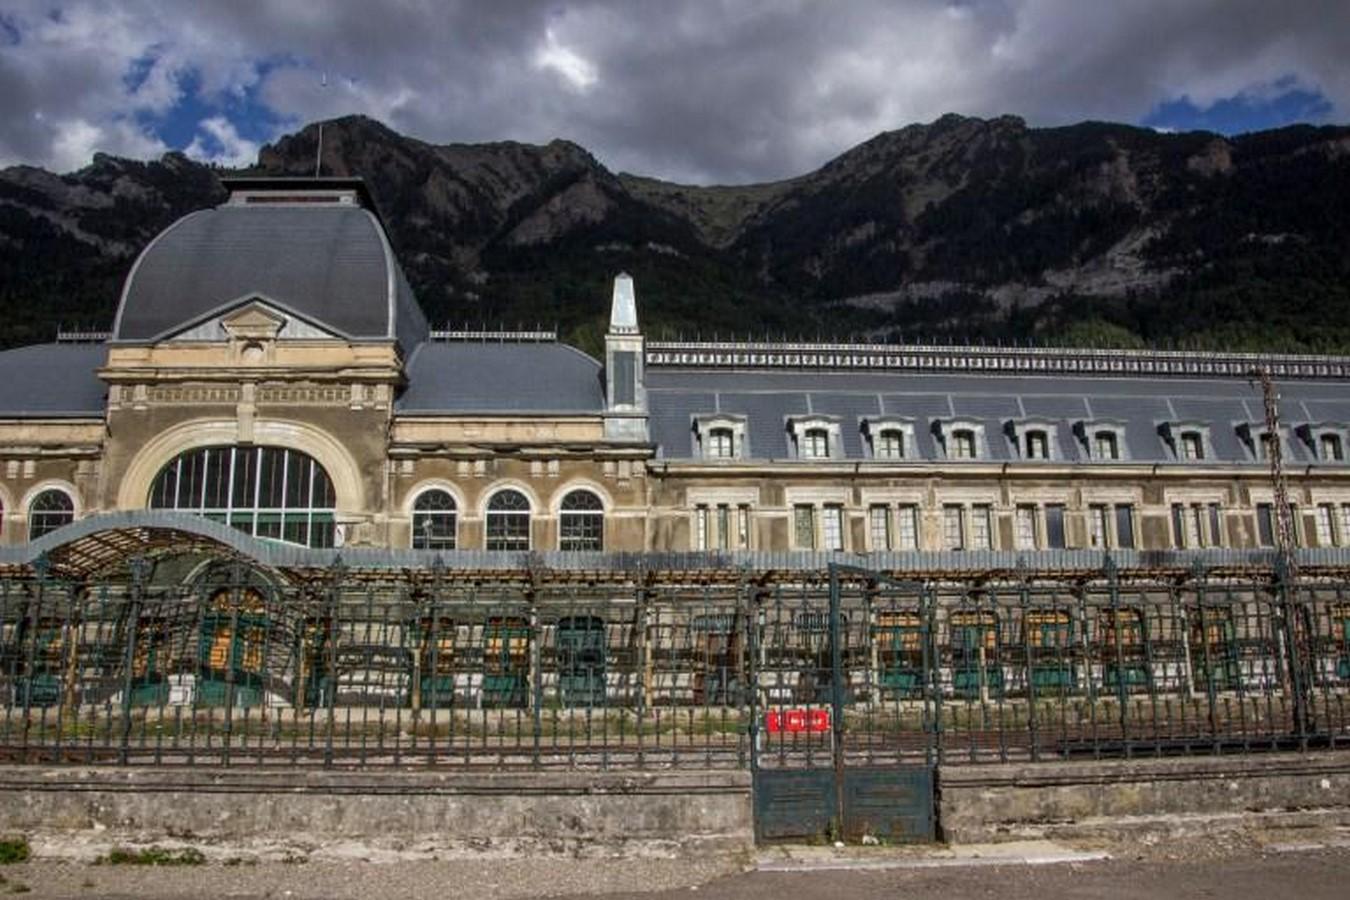 Canfranc International Railway Station - Spain - Sheet1